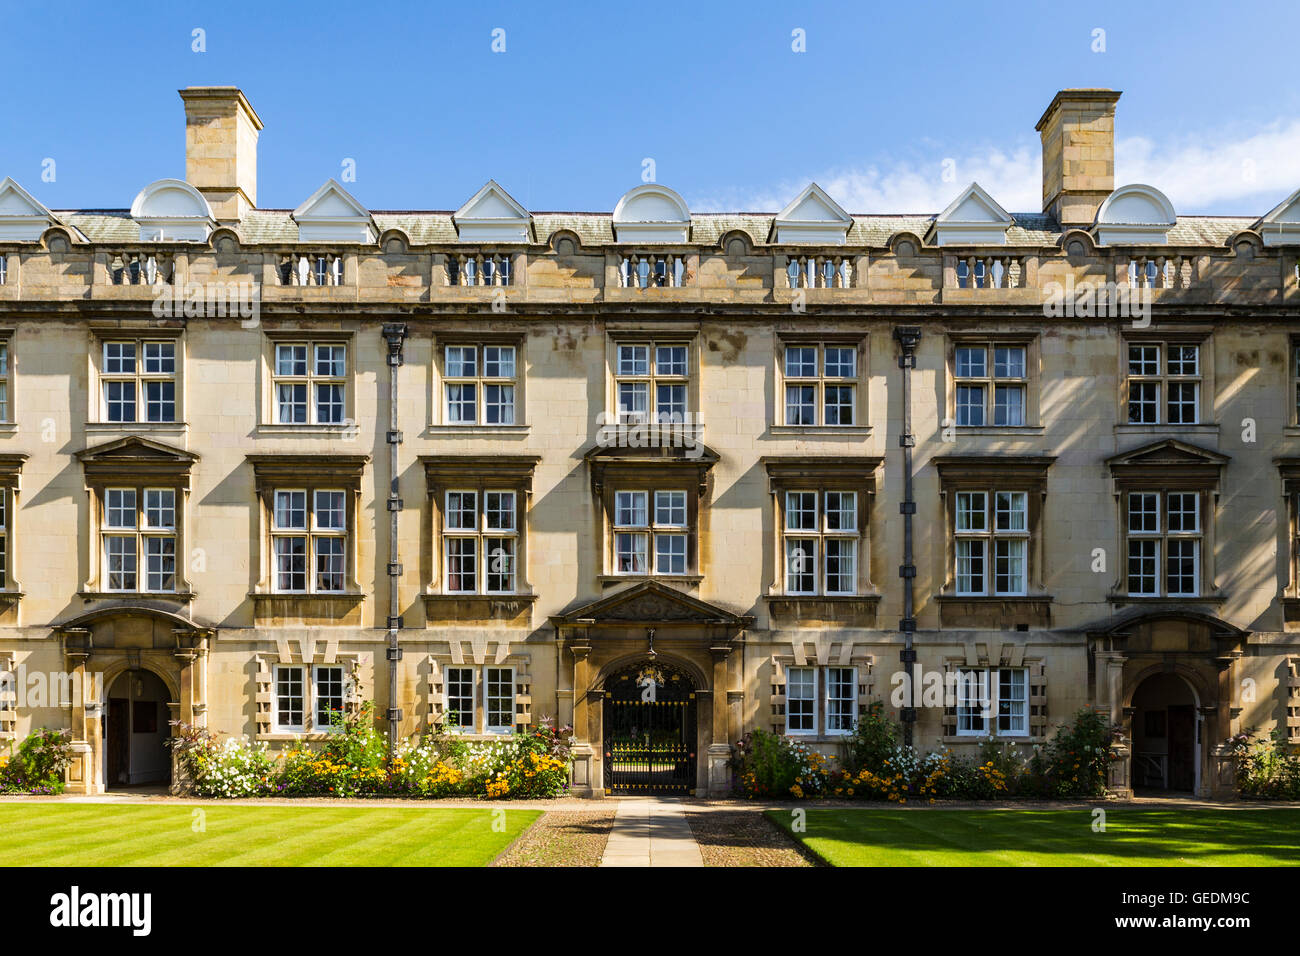 Fellows Building, Christ's College, University of Cambridge, Cambridge, England, United Kingdom - Stock Image